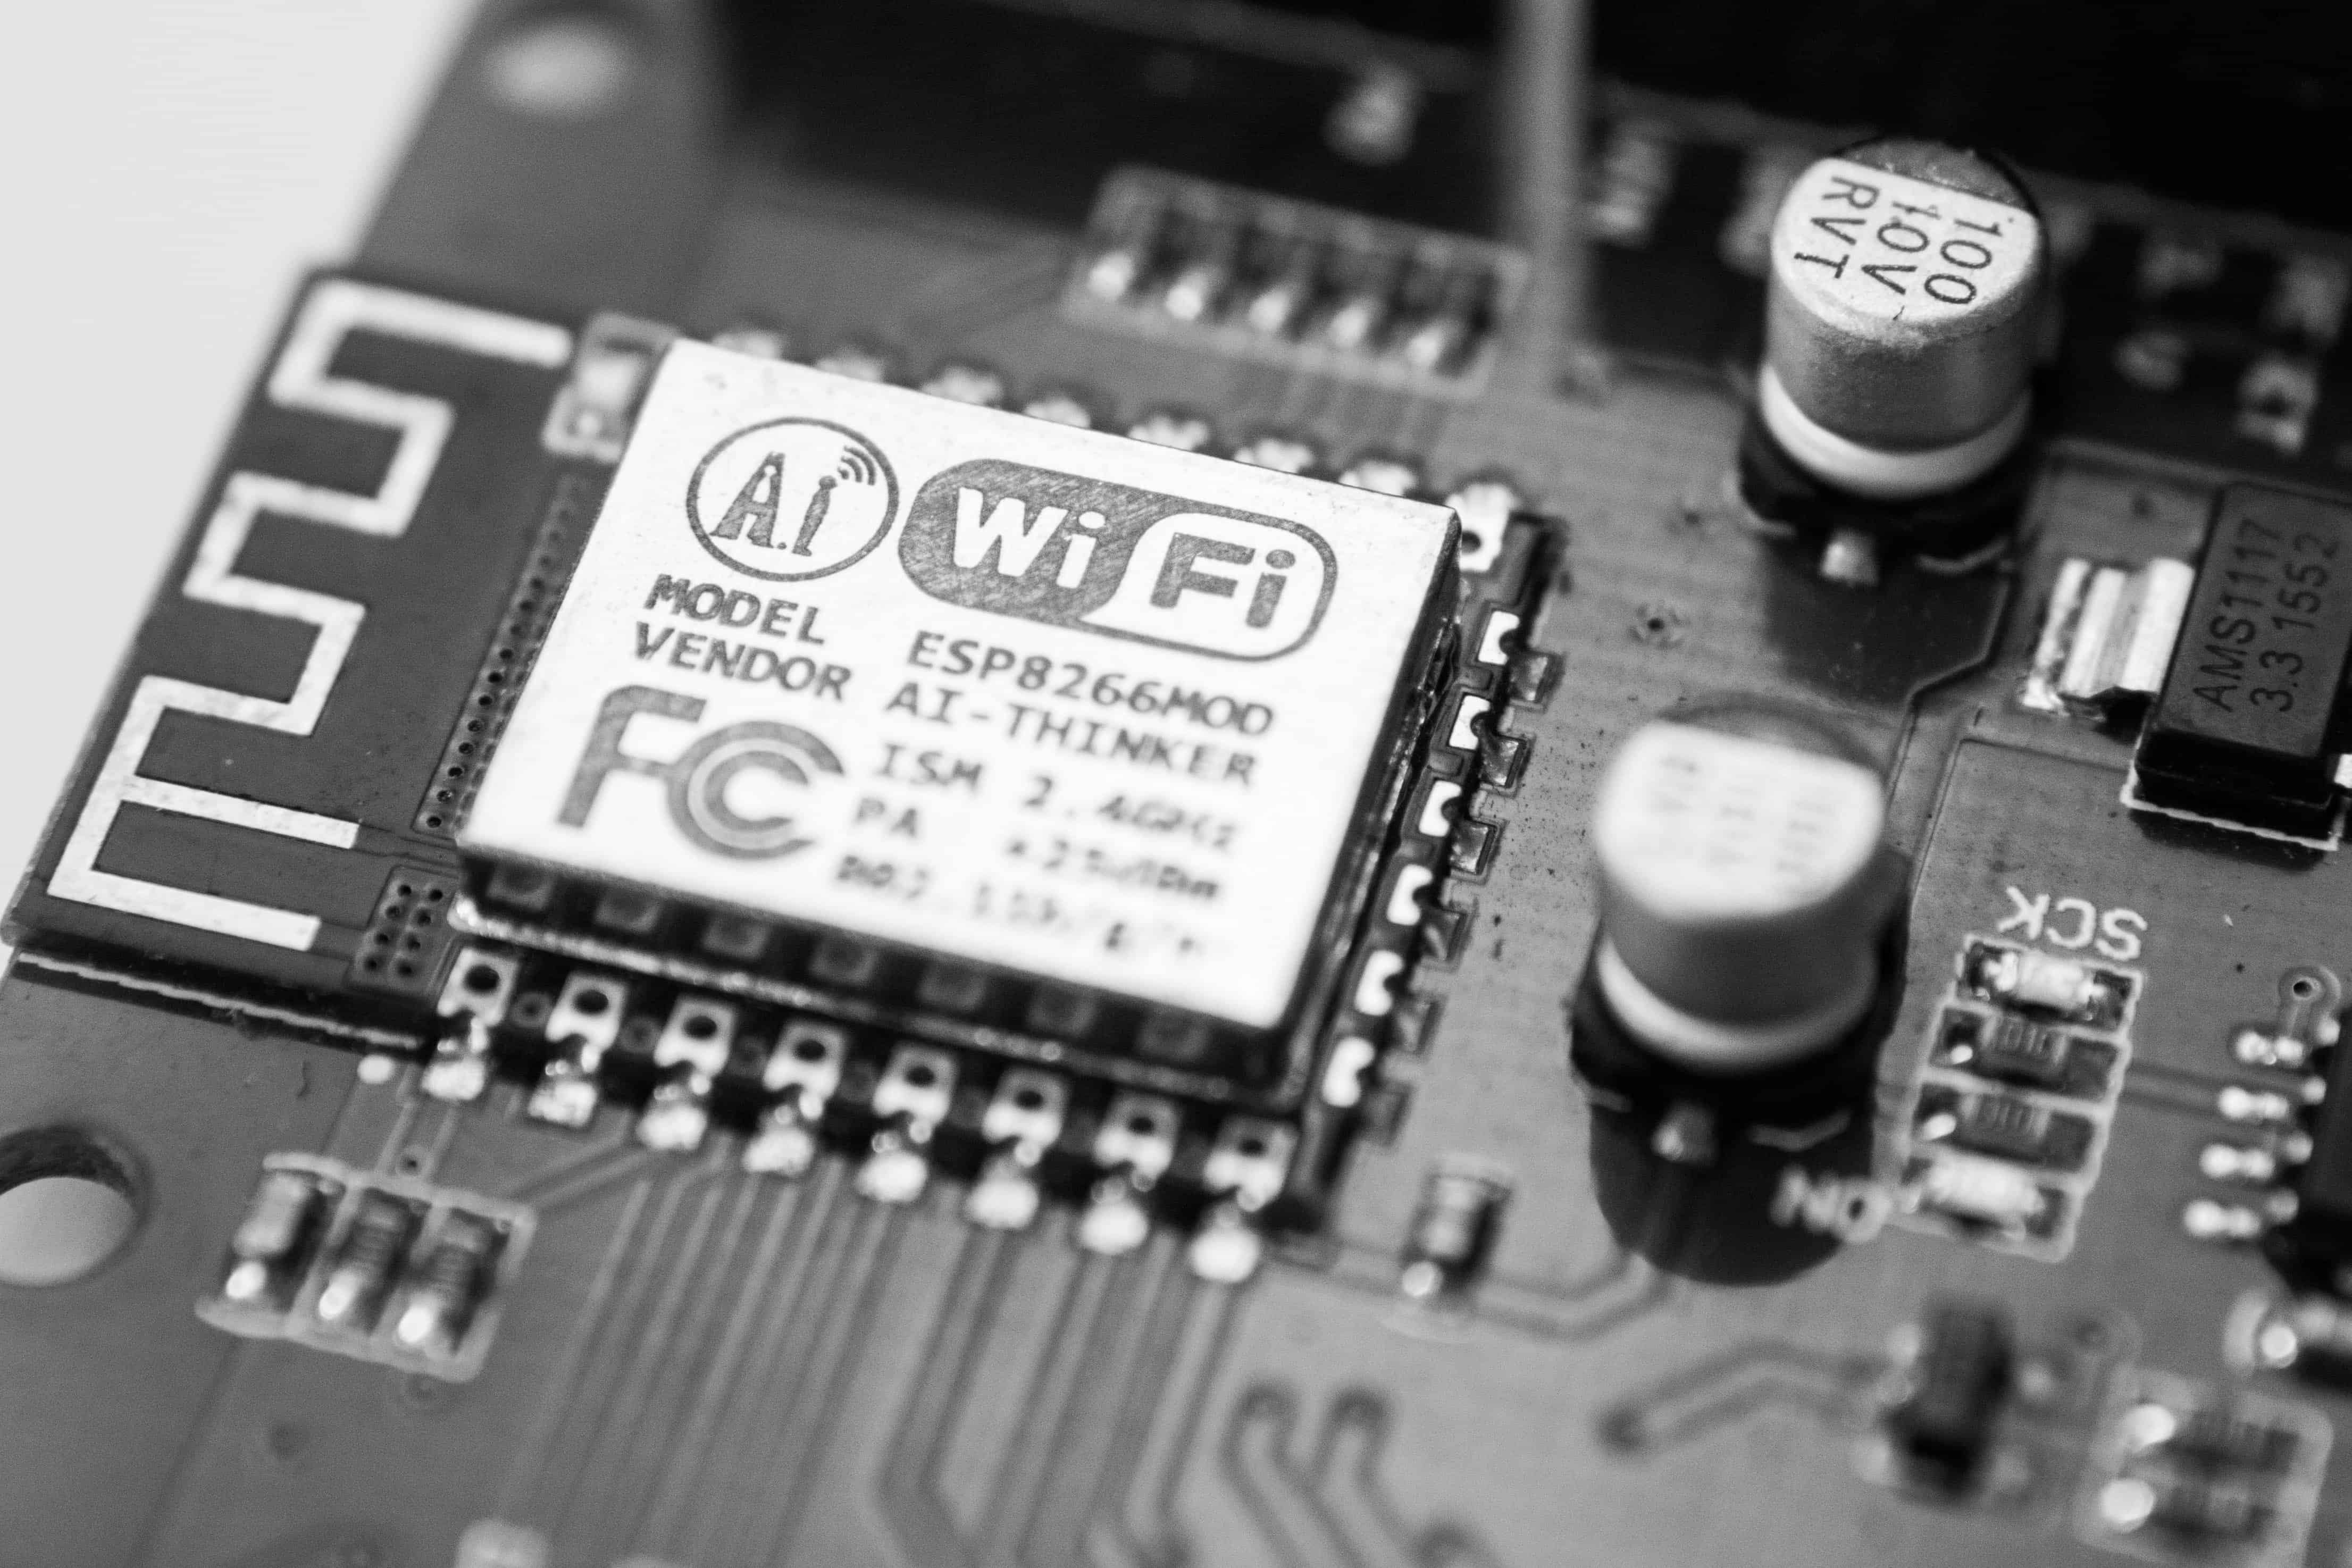 frank wang 2mVEwwcao Y unsplash - Intelligent Wi-Fi: 9 Best Practices for Restaurant Captive Portals